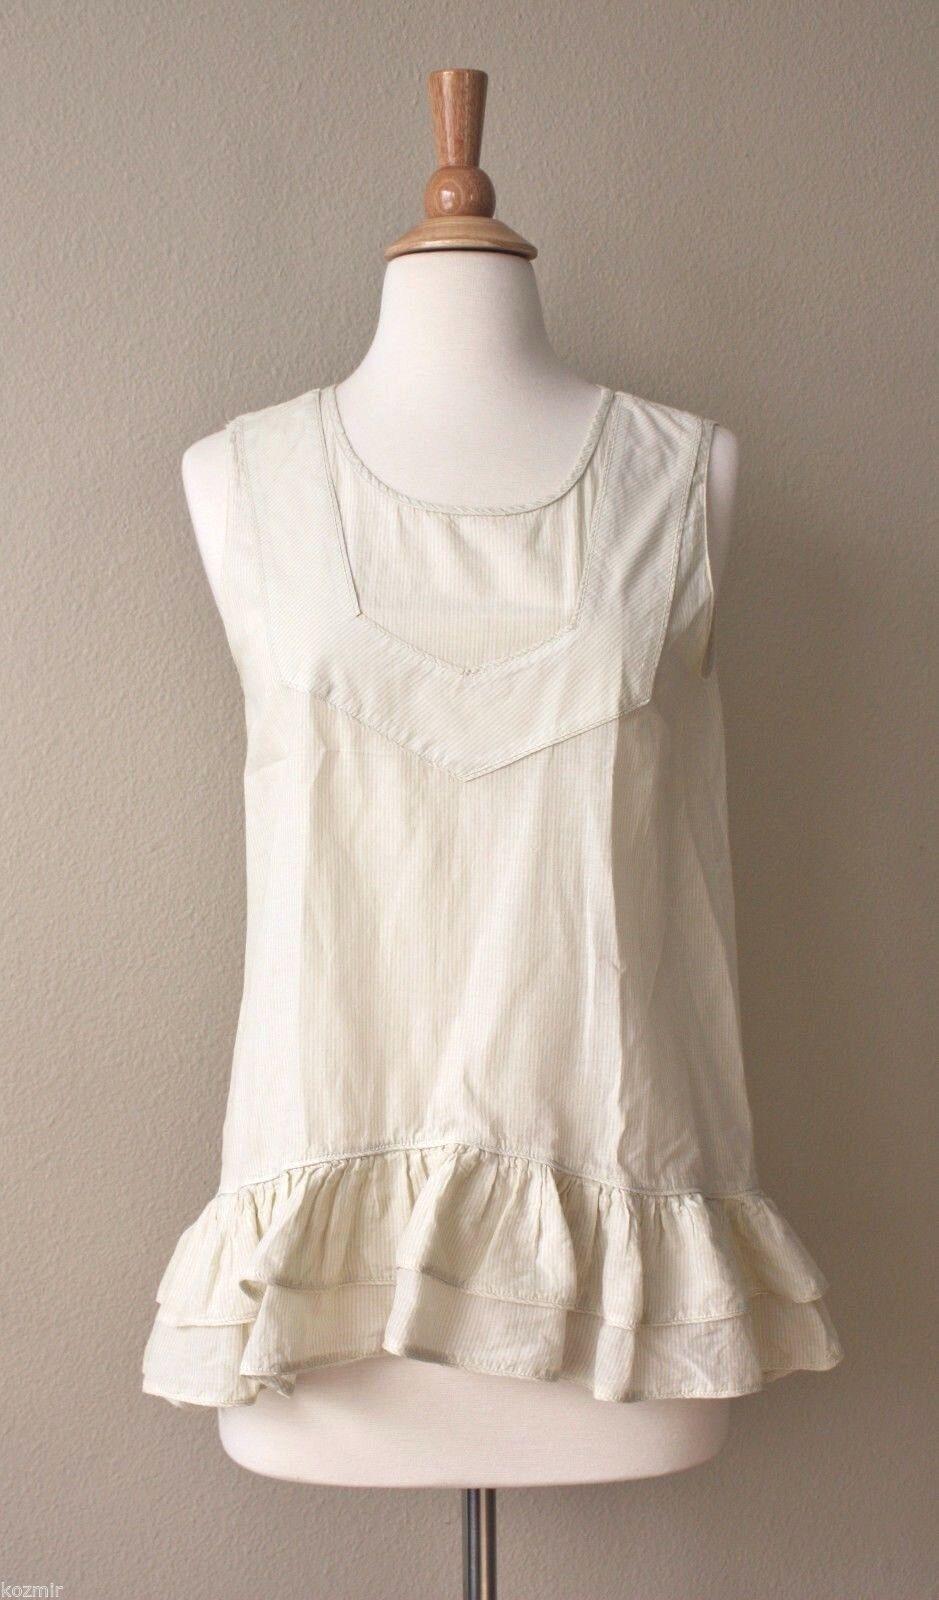 MARC by MARC JACOBS RUFFLE HEM TANK Sleeveless Off Weiß Hemd Trend oben S Silk